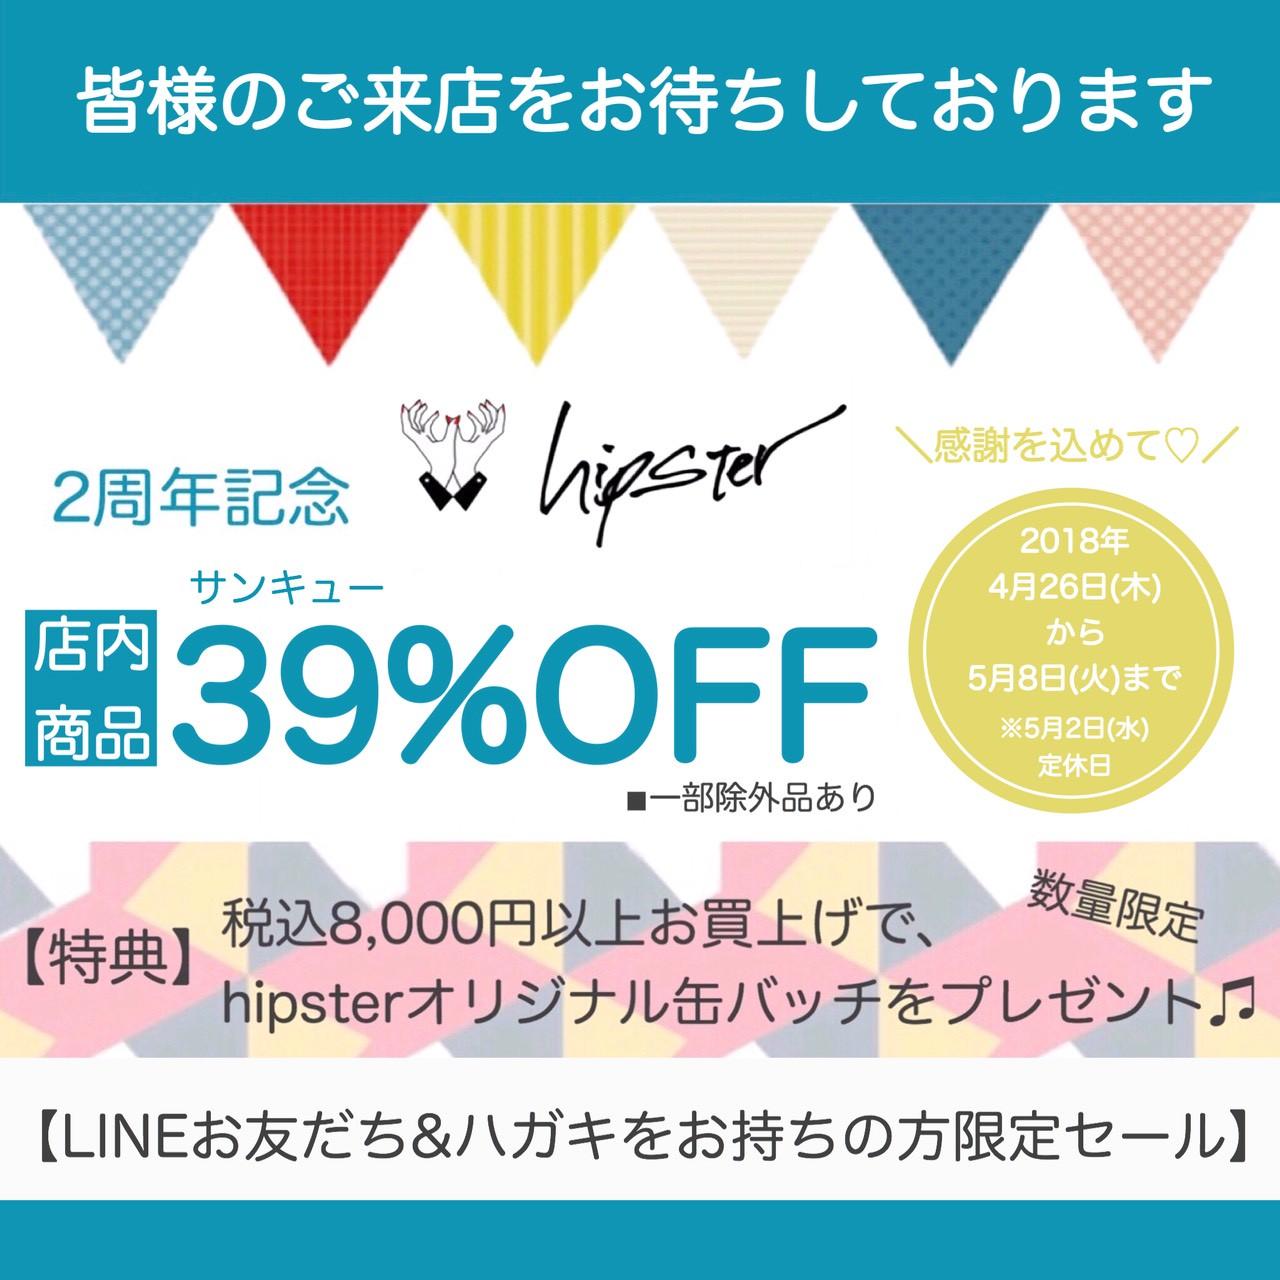 ★hipster 二周年イベント対象アイテム紹介★